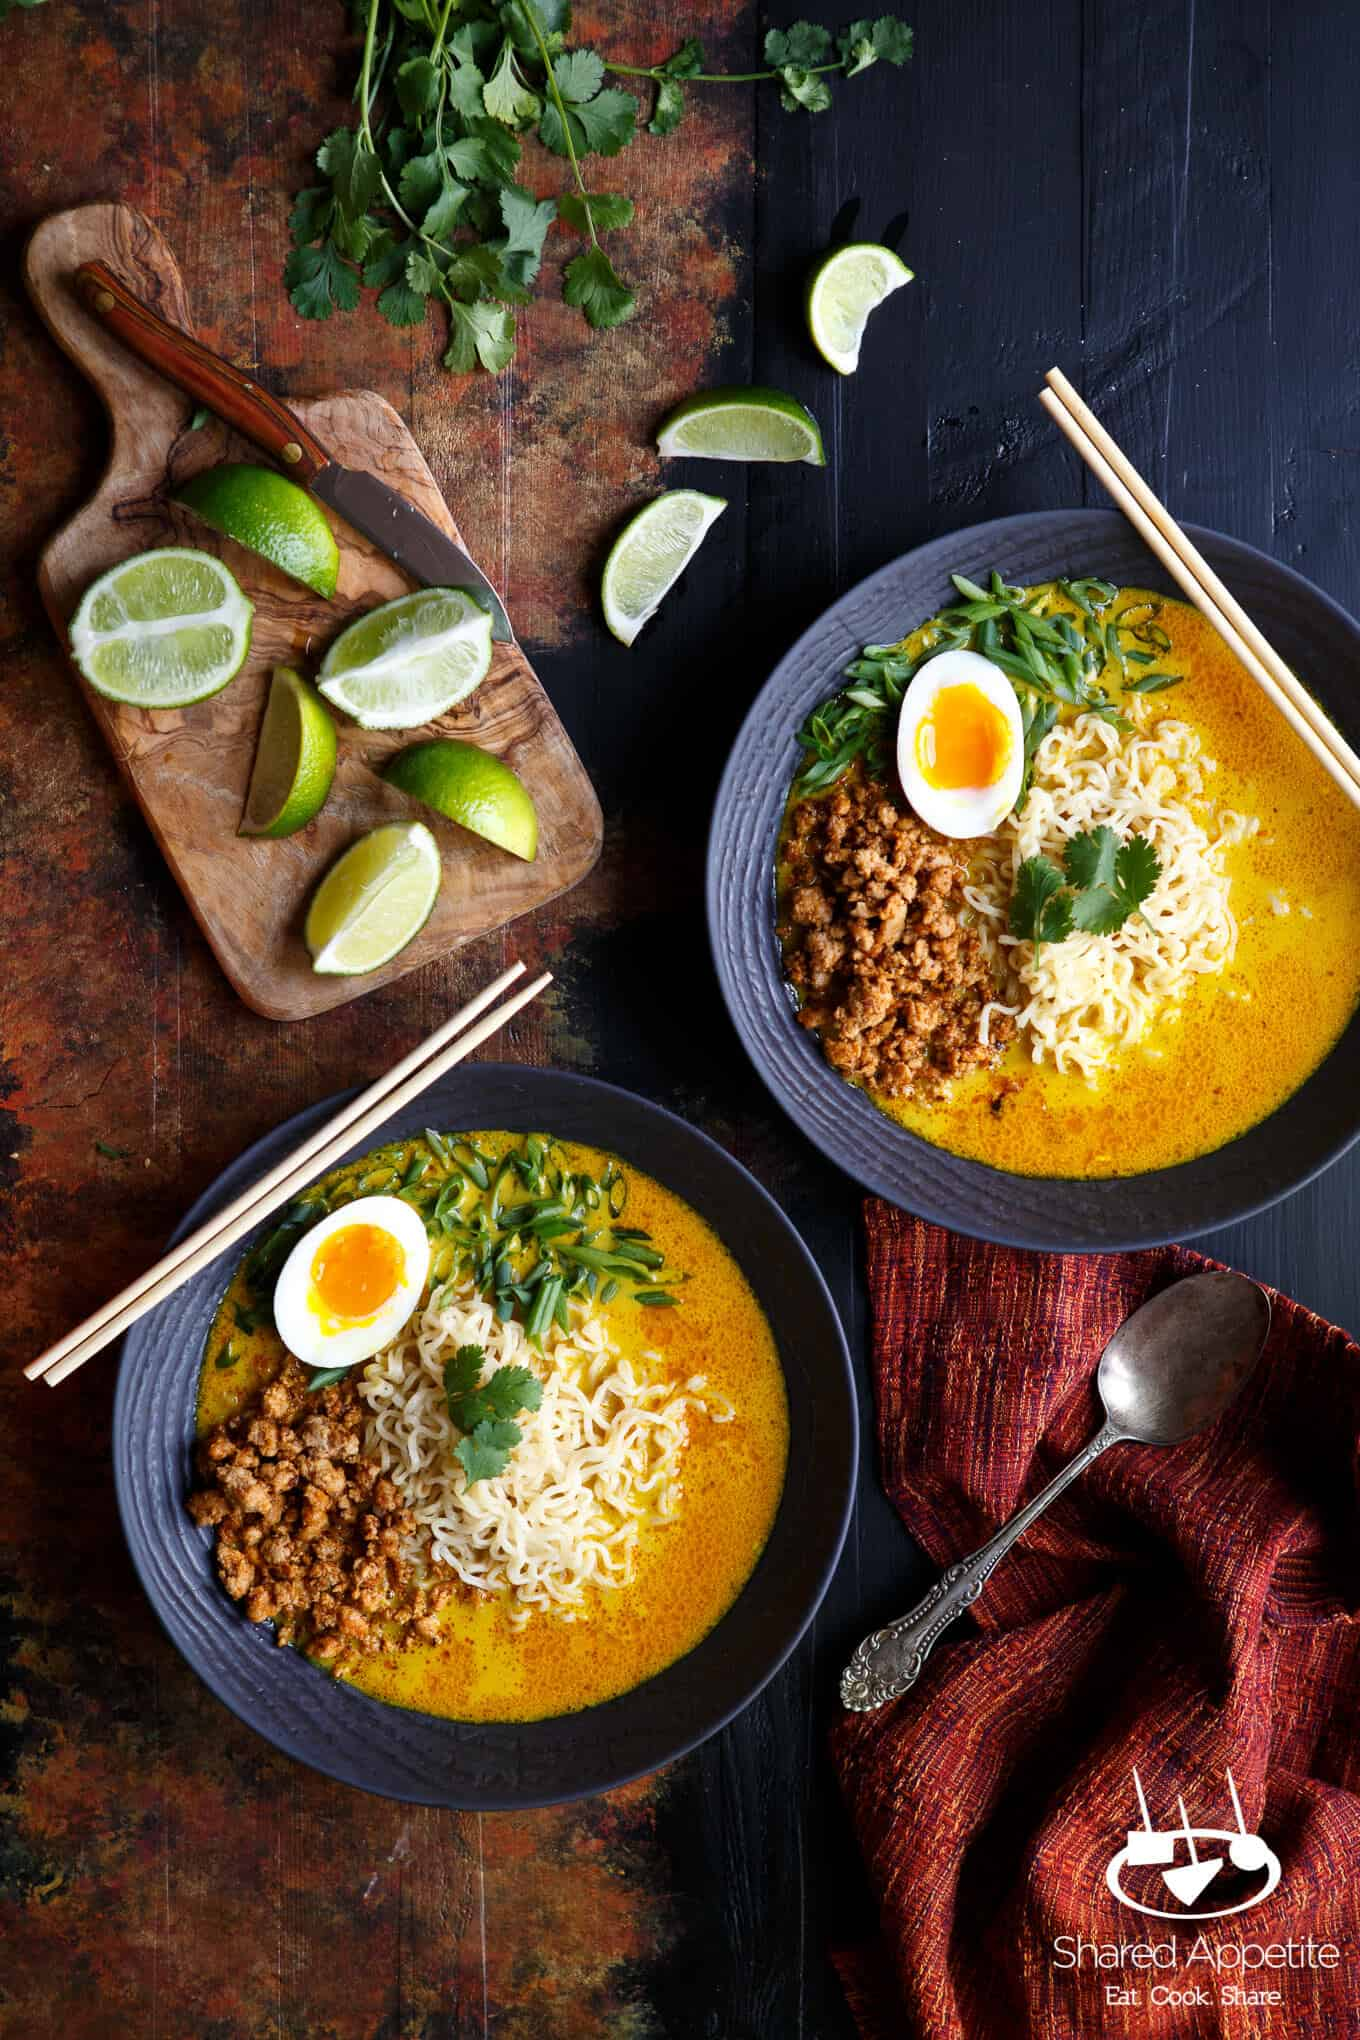 Spicy Pork Thai Coconut Curry Ramen with a Khao Soi soup base | sharedappetite.com